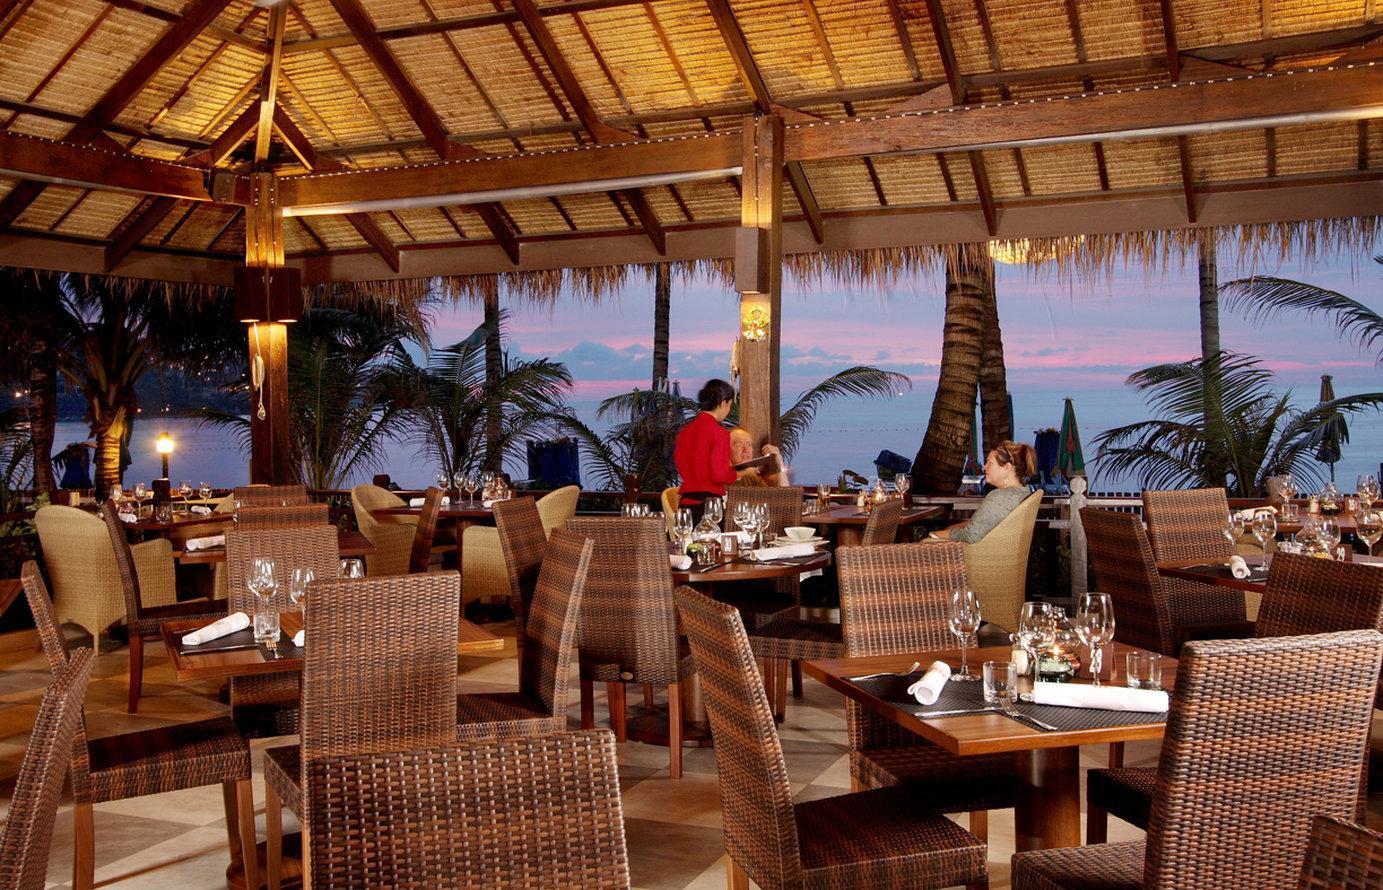 Kamala Beach Resort. A Sunprime Resort - Image 5